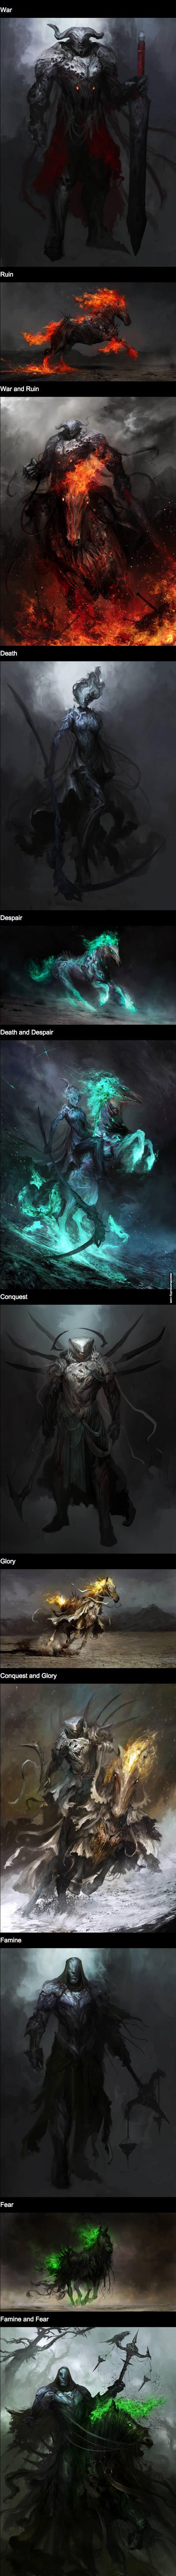 Four horseman of Apocalypse